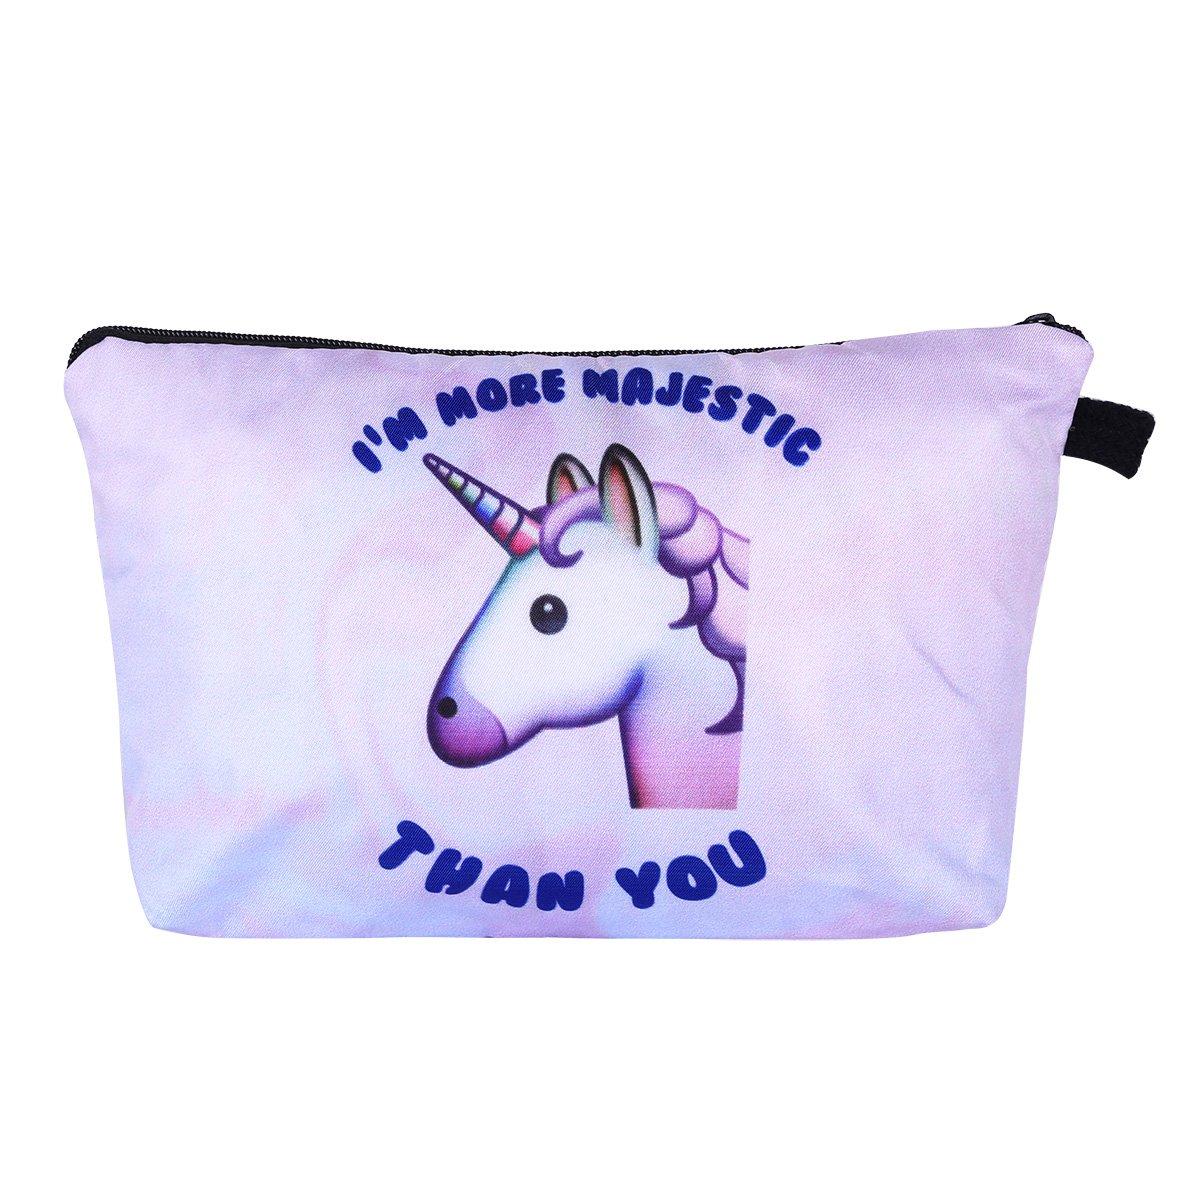 Multi-purpose Unicorn Cosmetic Makeup Pouch Travel Case Bills Changes Keys Storage Bag Kids Pencil Case